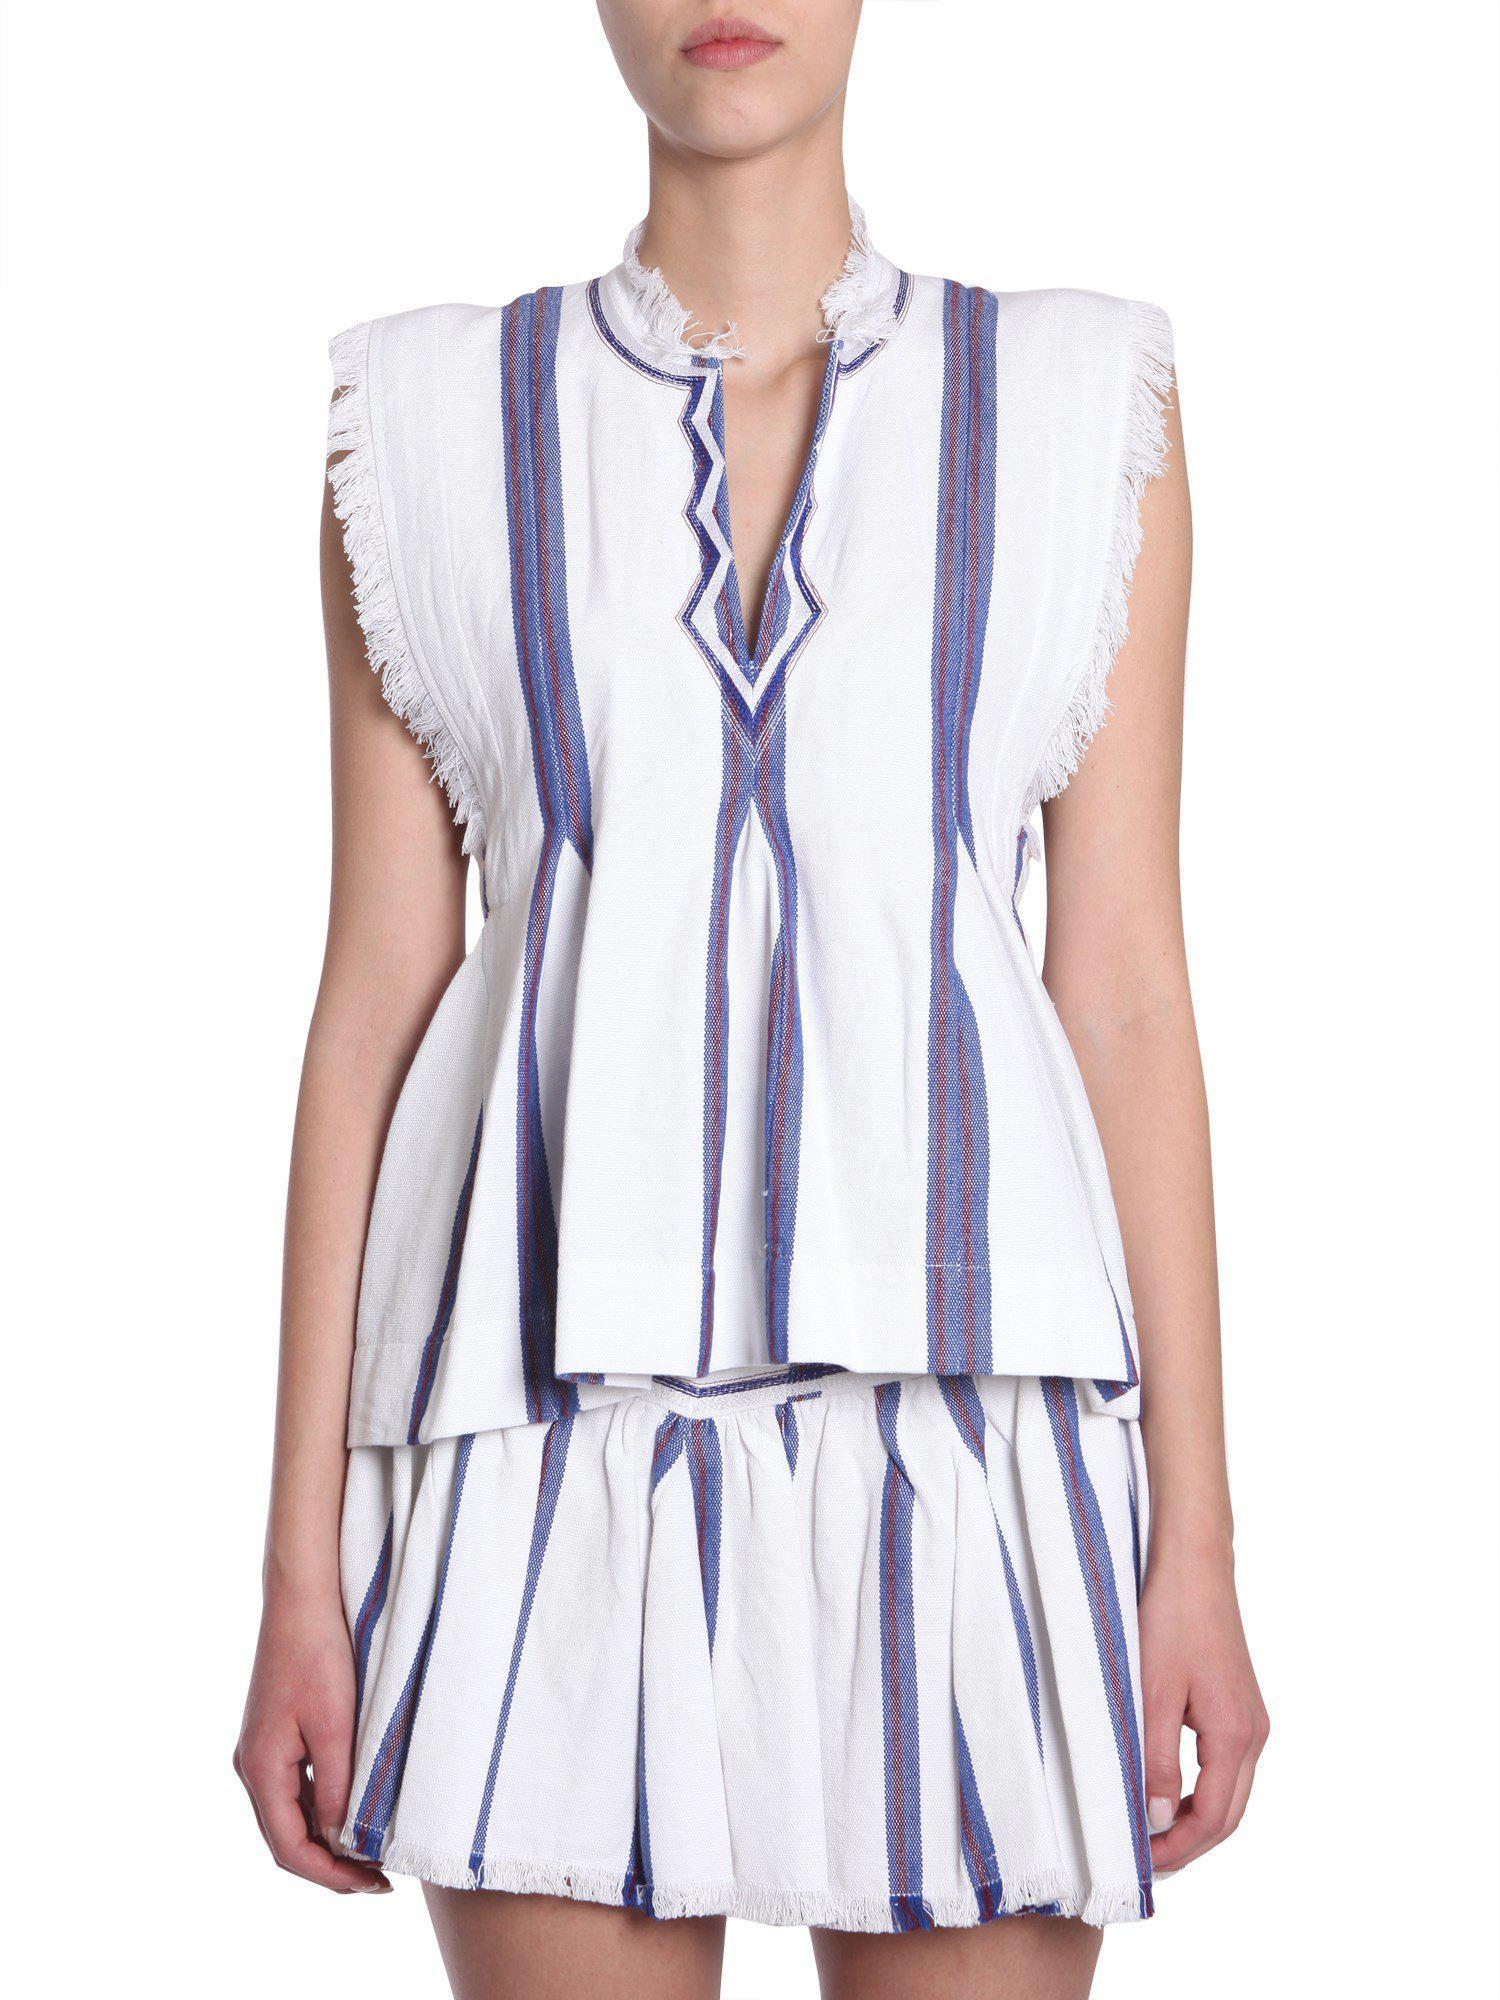 20341e41edb9f3 Lyst - Étoile Isabel Marant Drappy Cotton Top in Blue - Save 43%